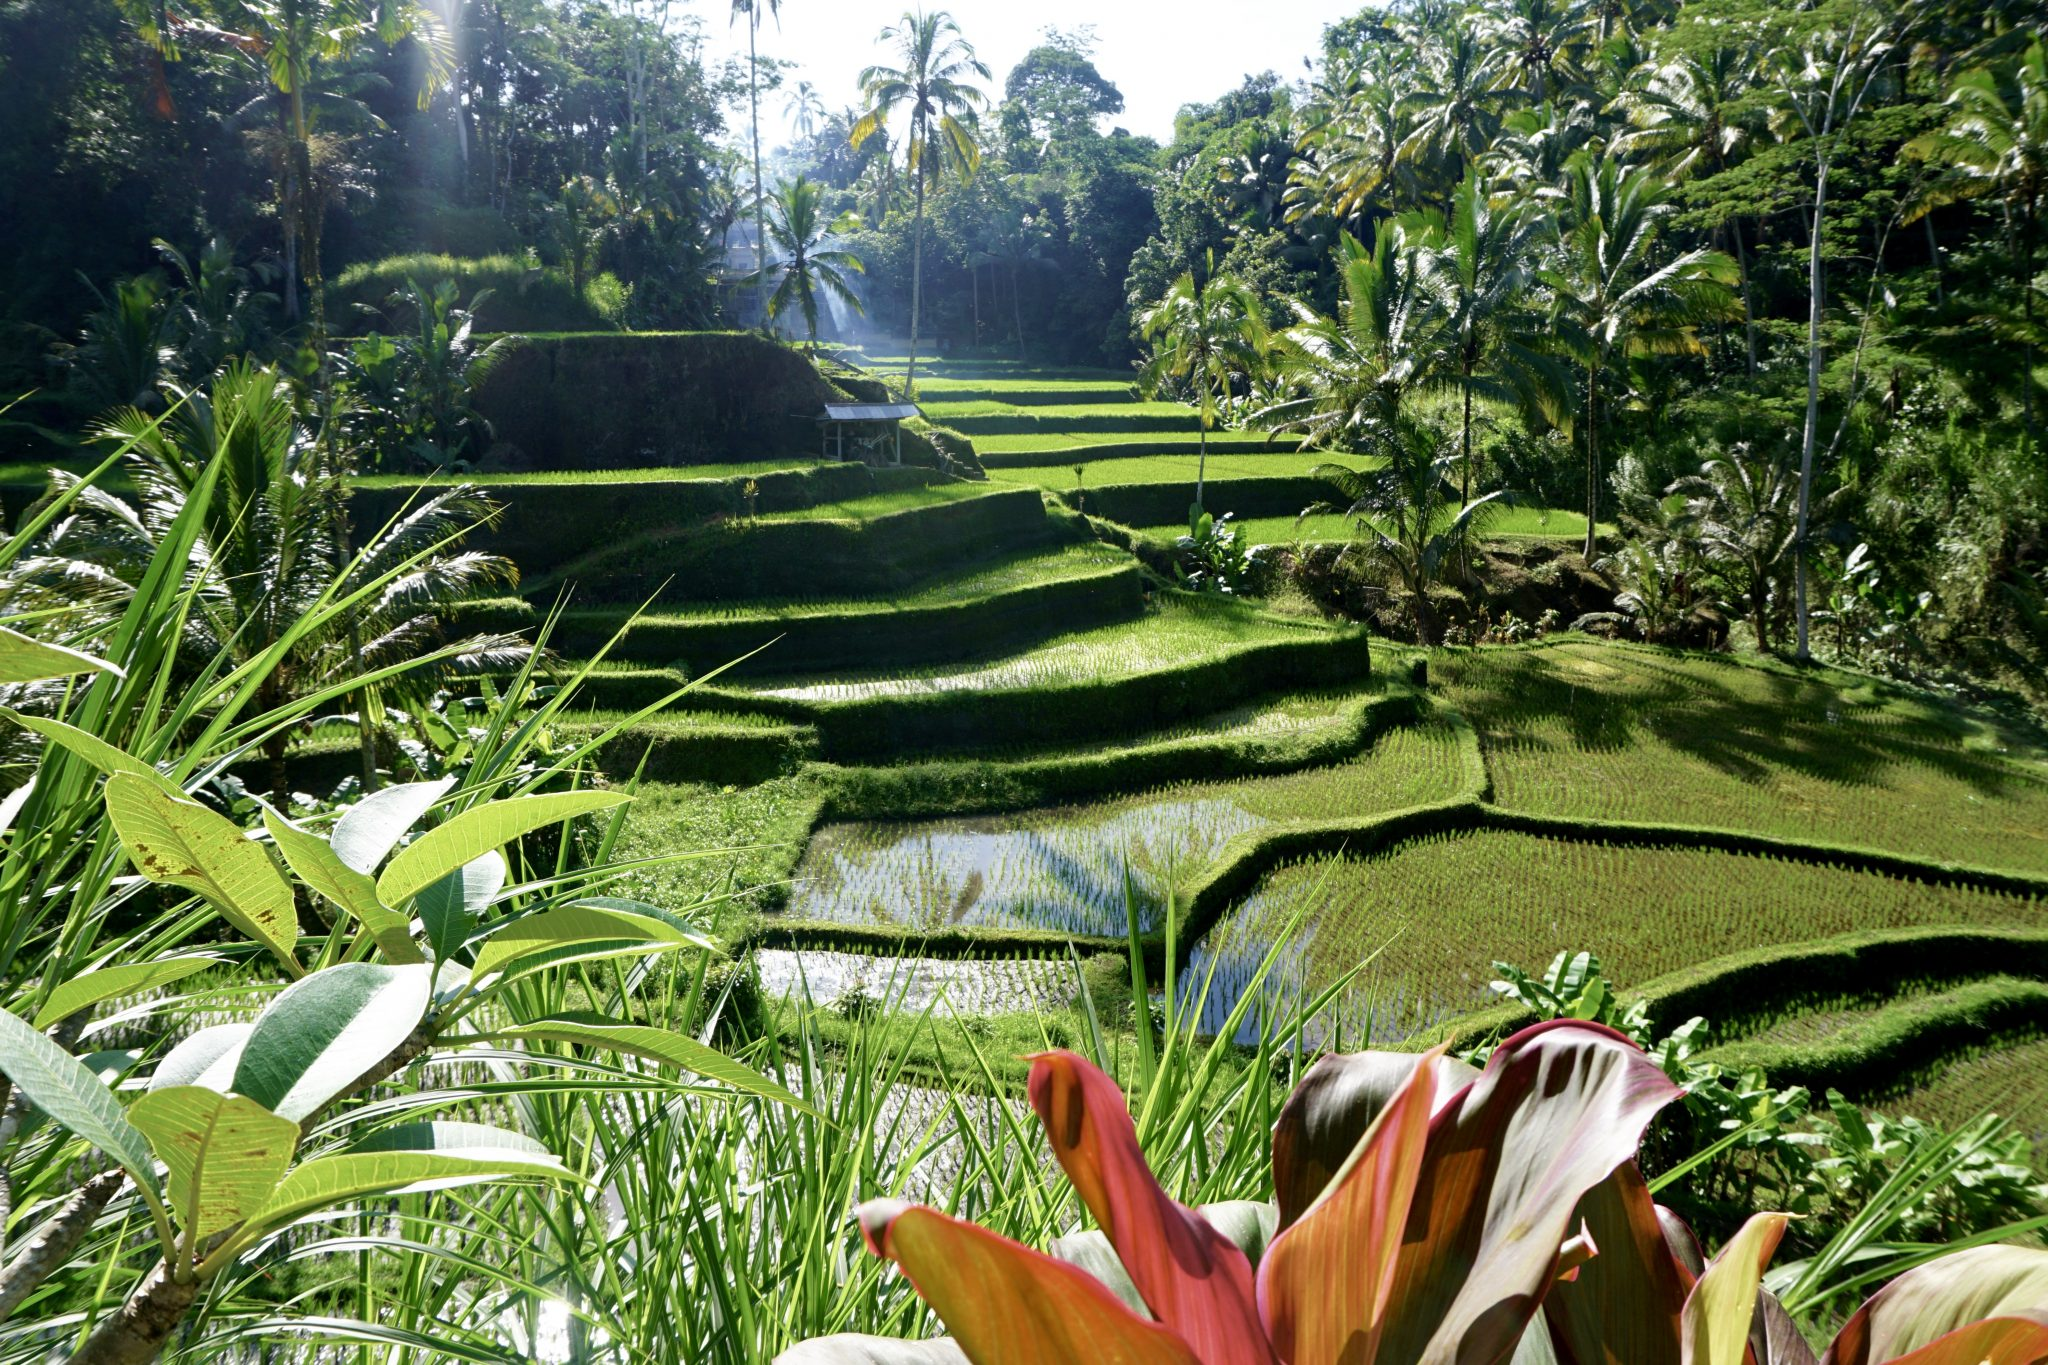 bali, rice terrace, ubud, tegalalang